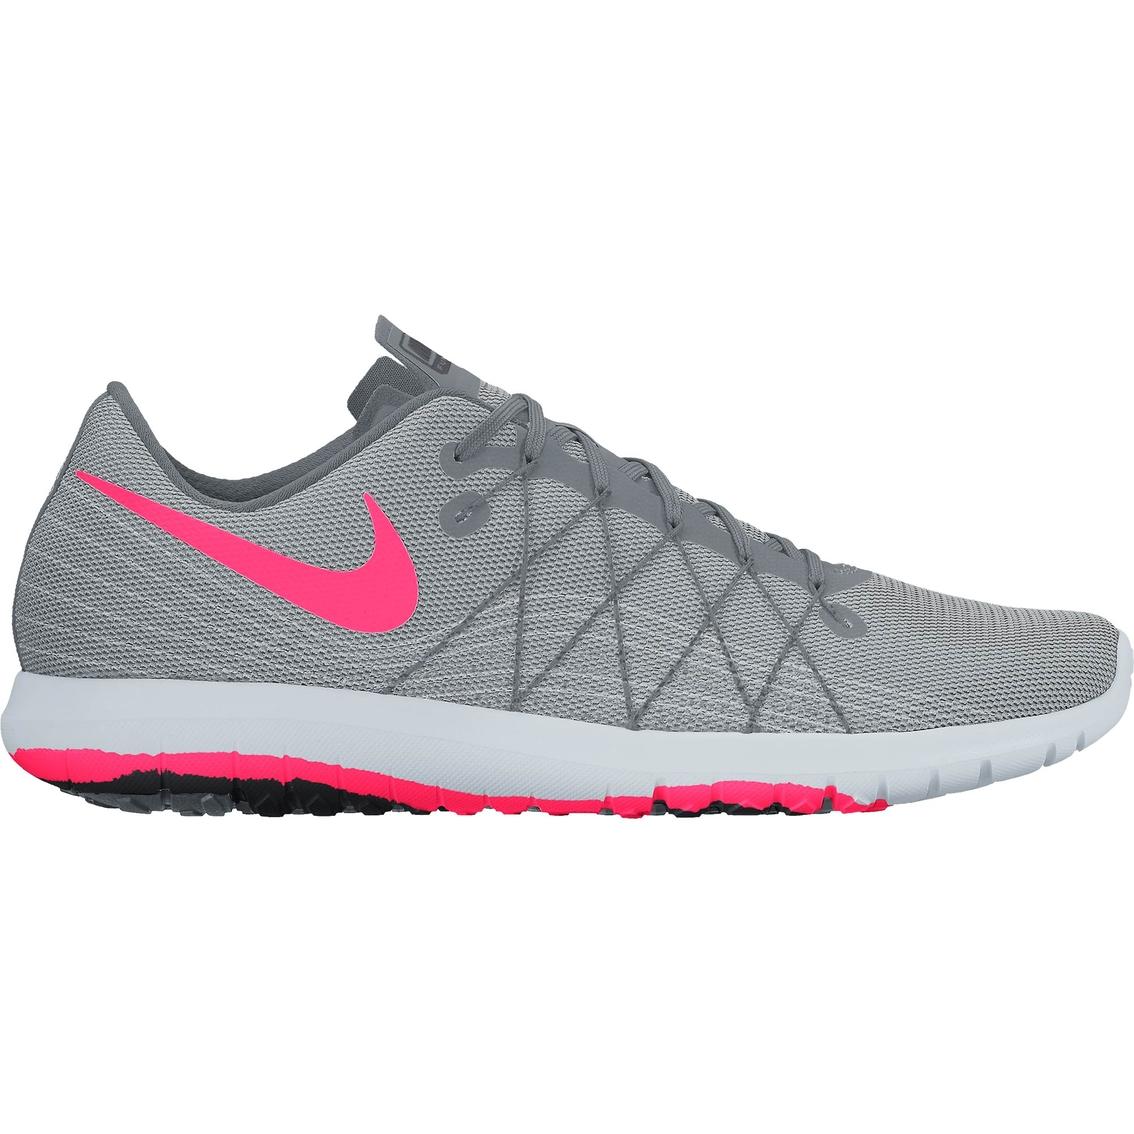 ac9e4d747666 ... wolf grey hyper pink glow pretty and 91f51 8f3ce  order nike womens  flex fury 2 running shoes 7d7a6 037c0